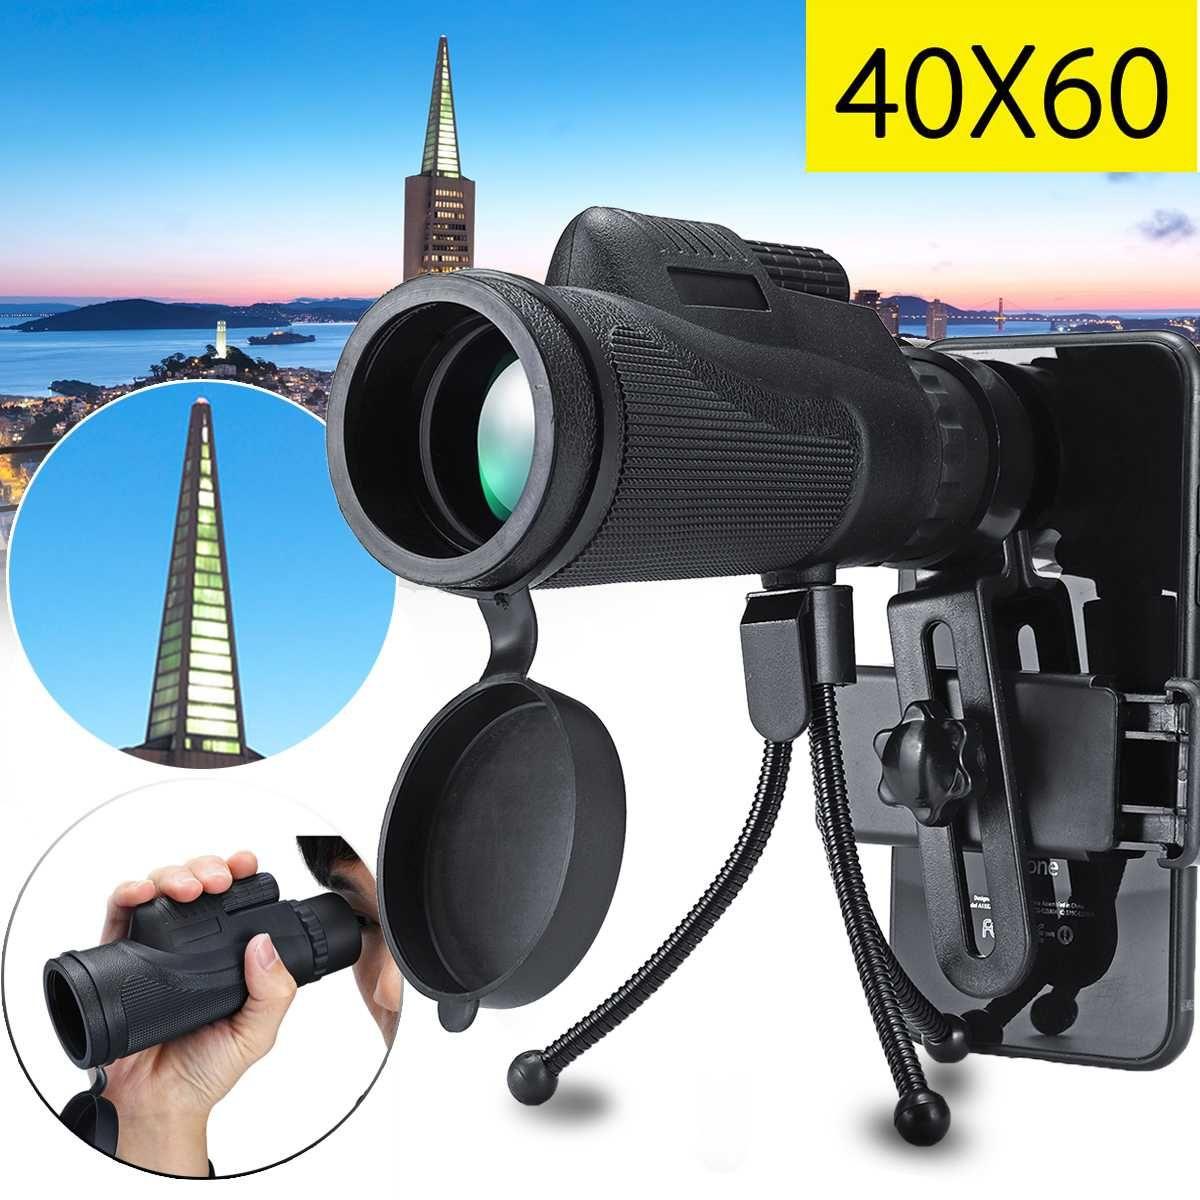 40X60 Telephone Telescope Lens Smartphone Monocular Telescope Scope Camera Camping Hiking Fishing with Mobile Phone Clip Tripod